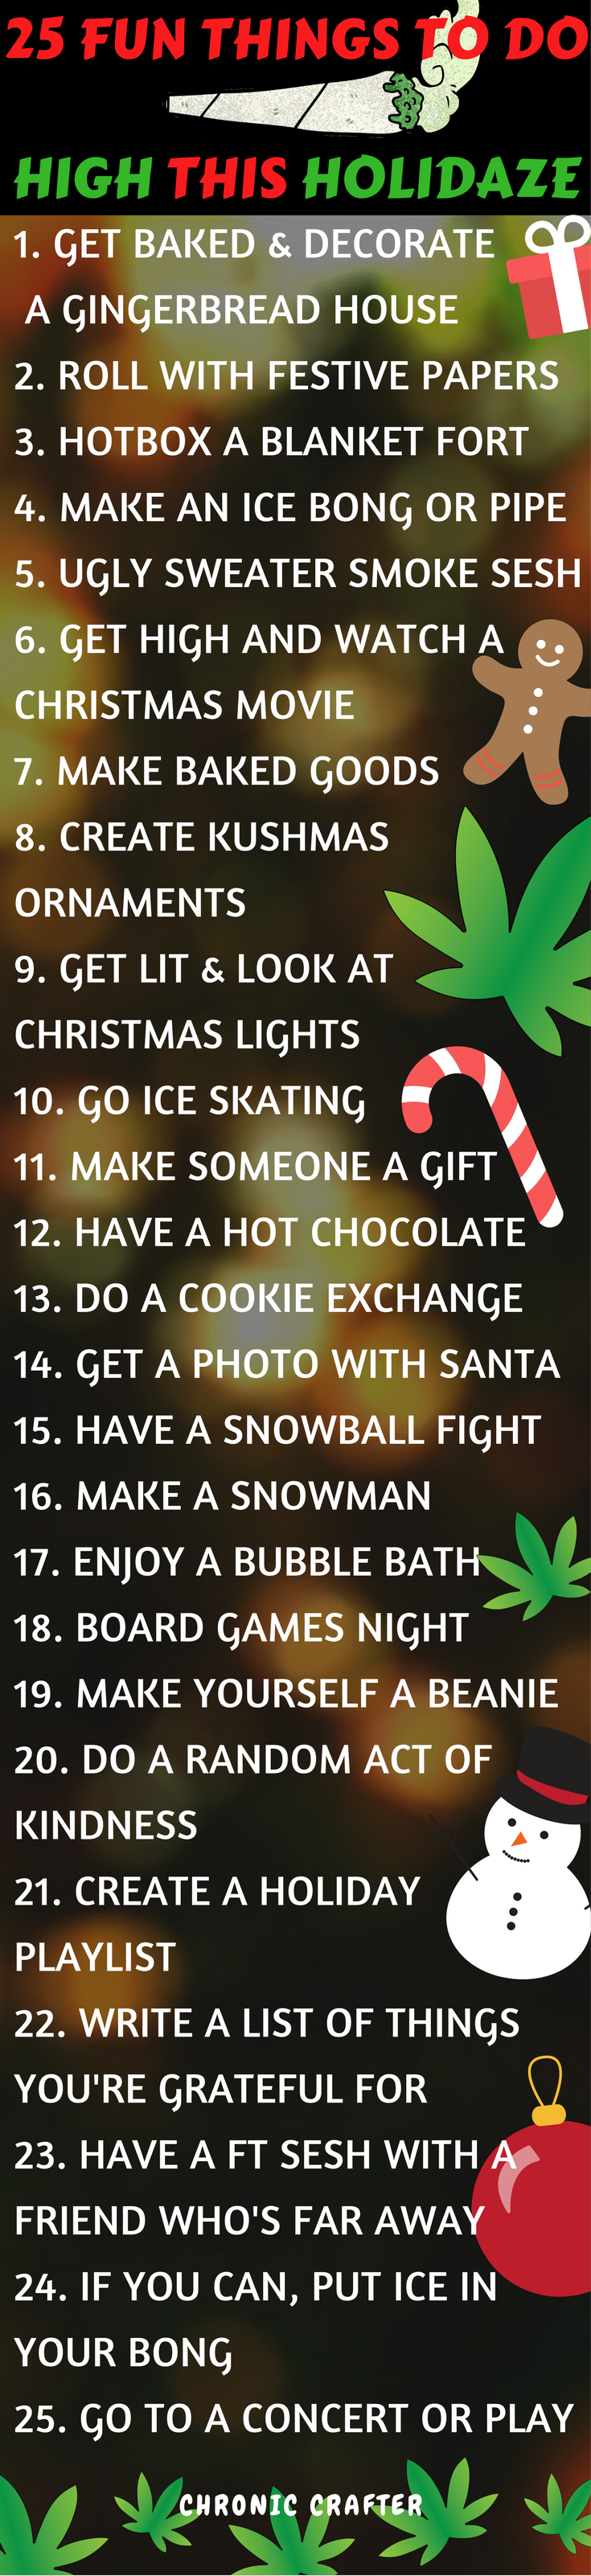 25 Fun Things to Do High this Holidaze Kushmas